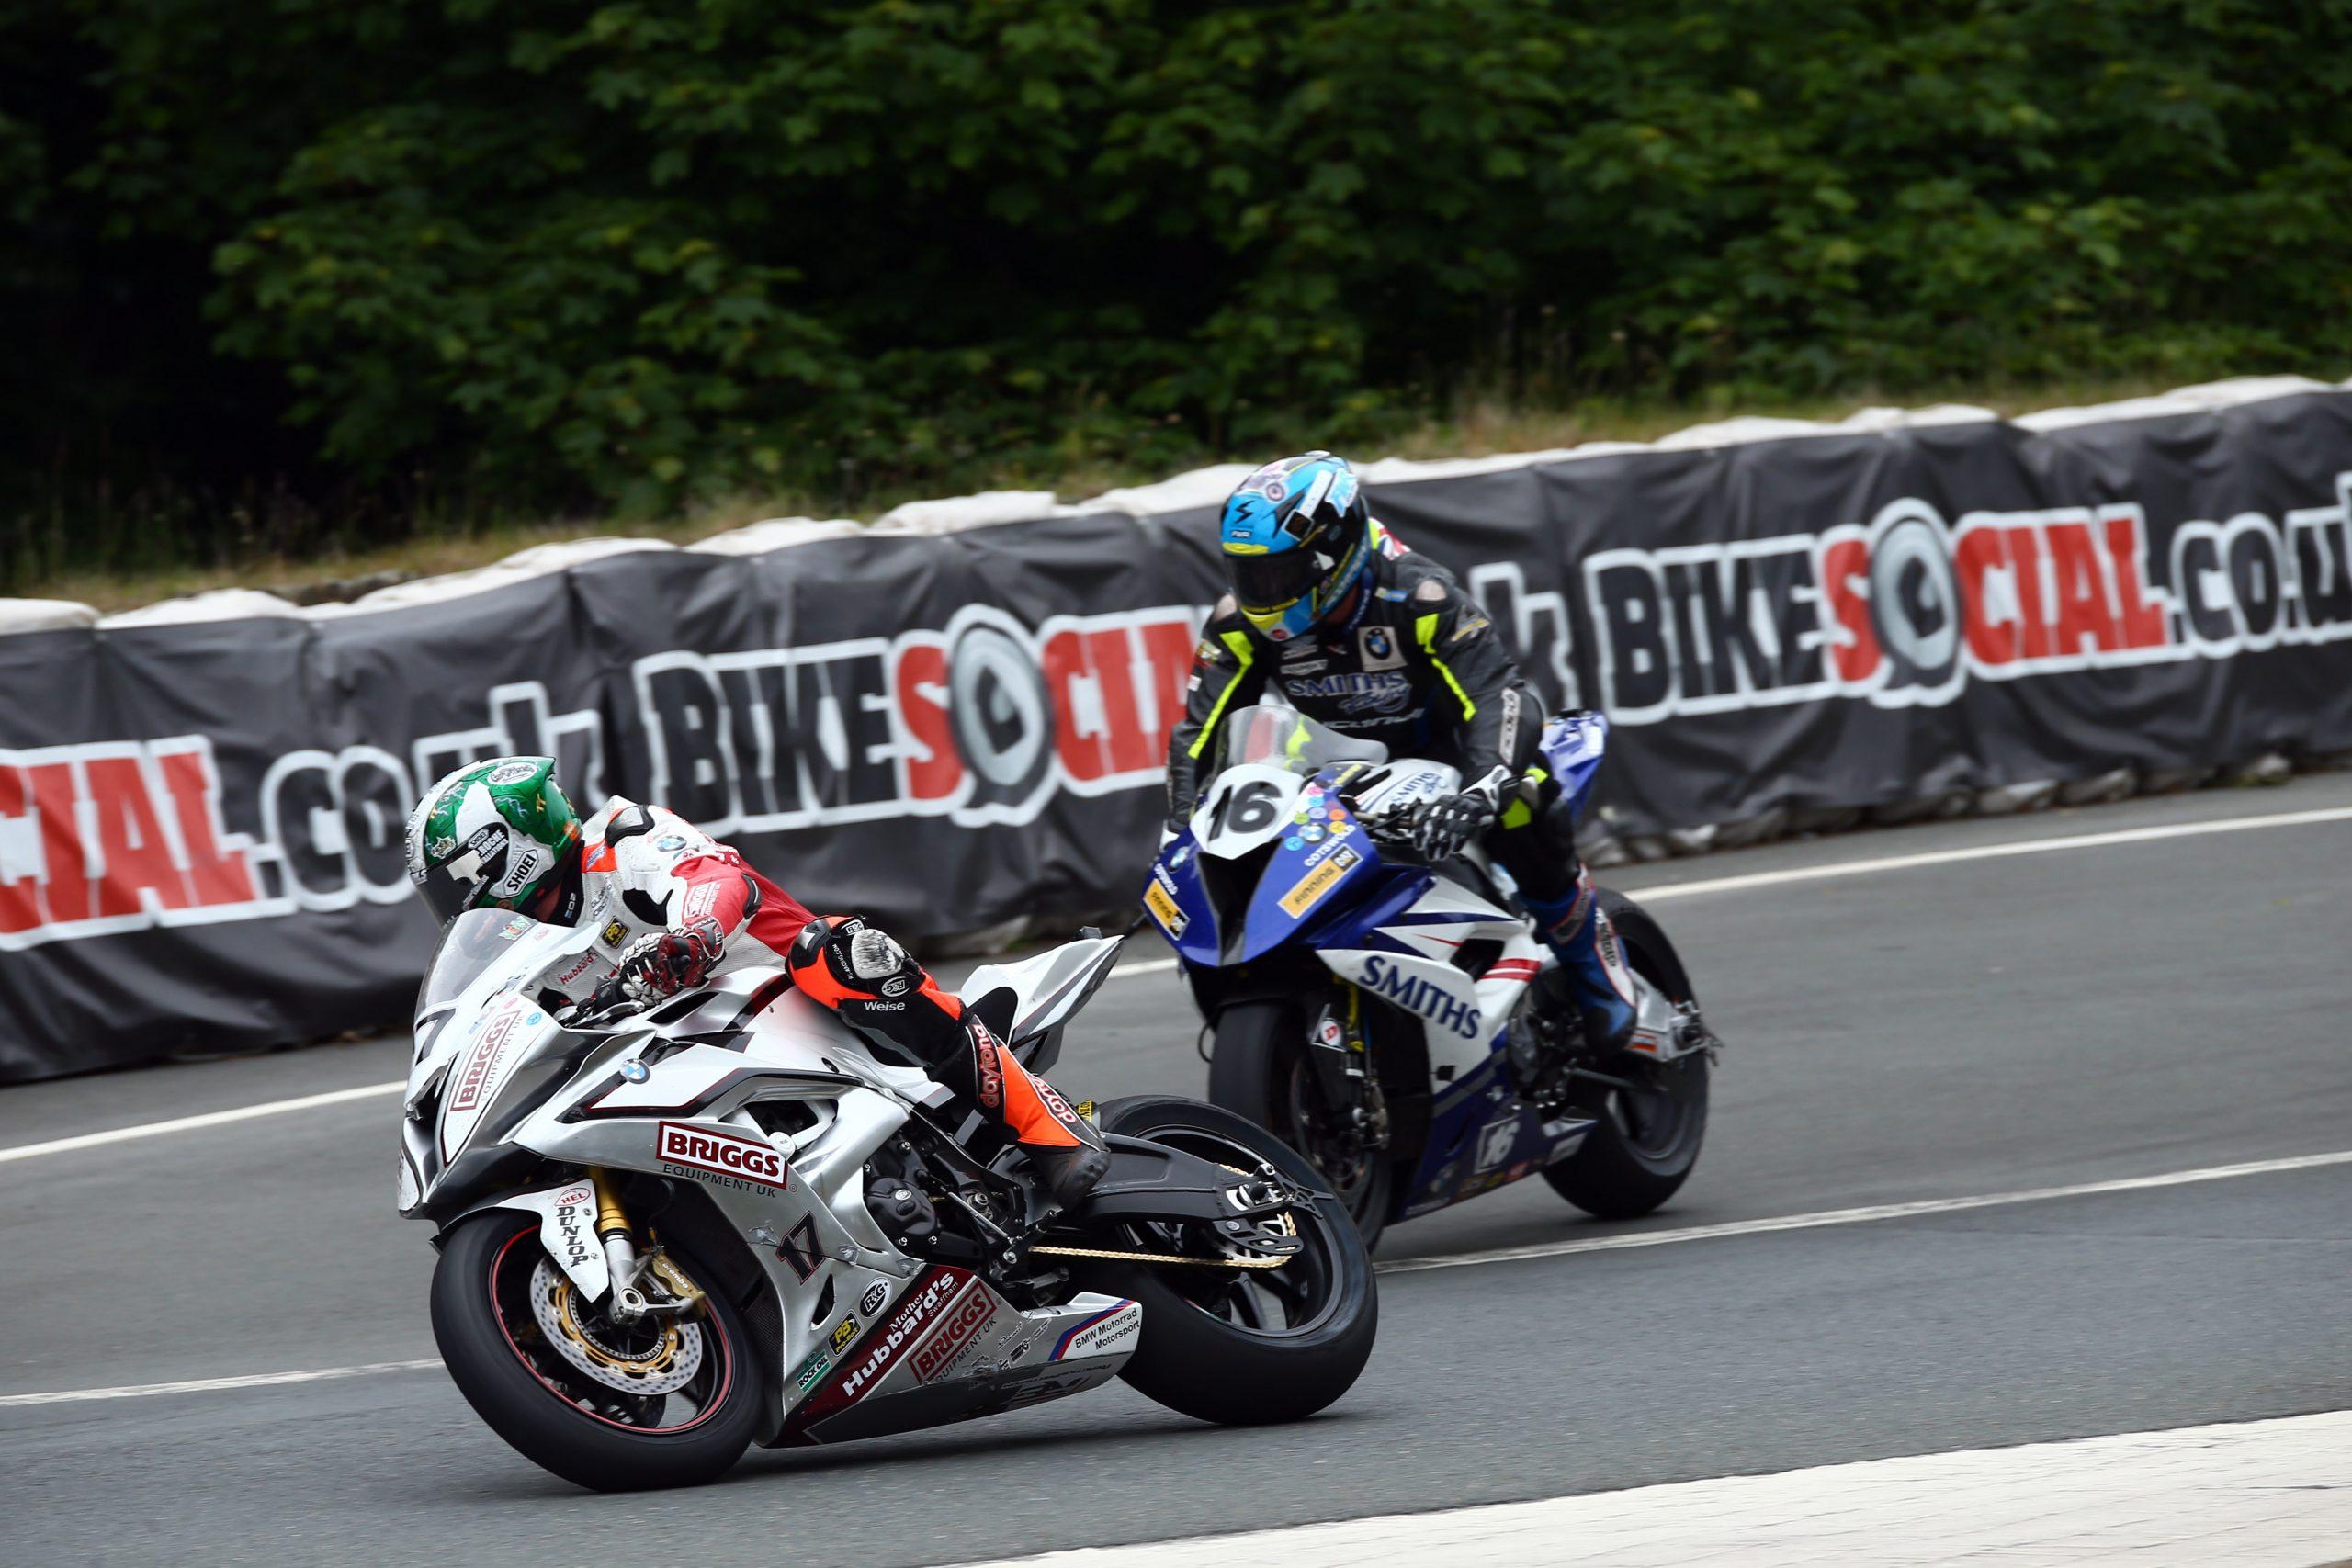 Peter Hickmand and David Johnson at the TT